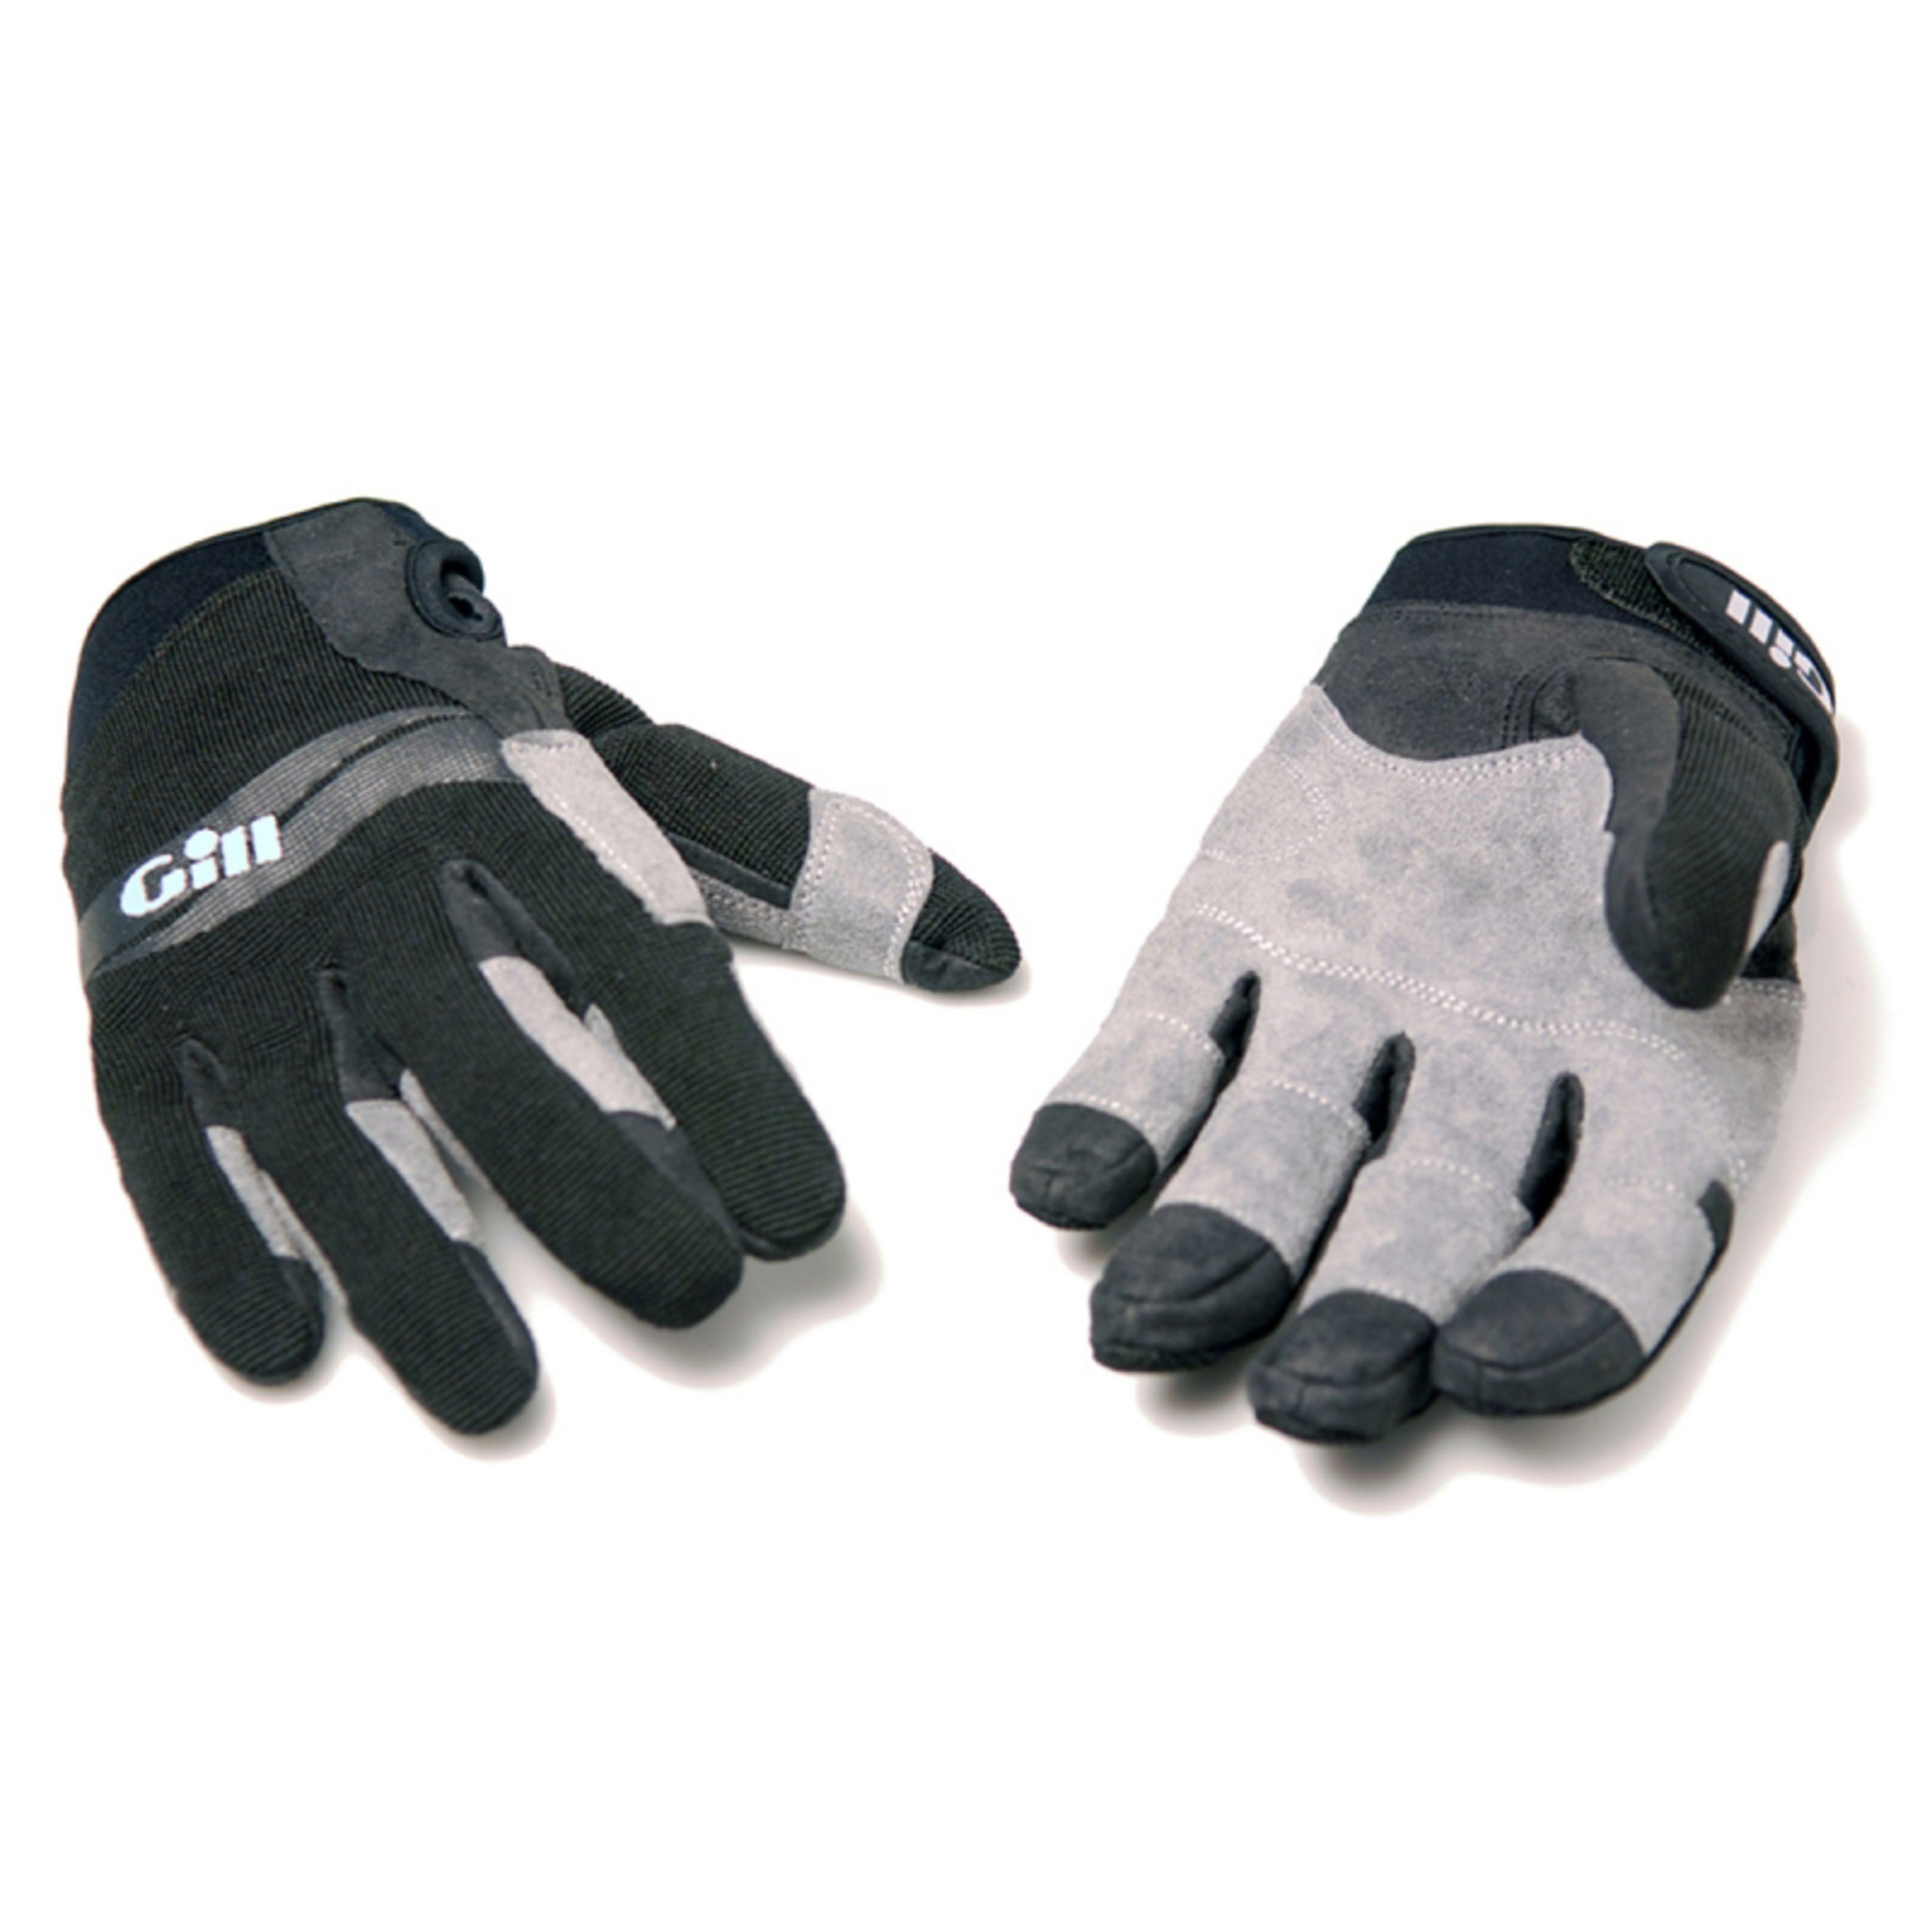 Gill - 5-Finger L